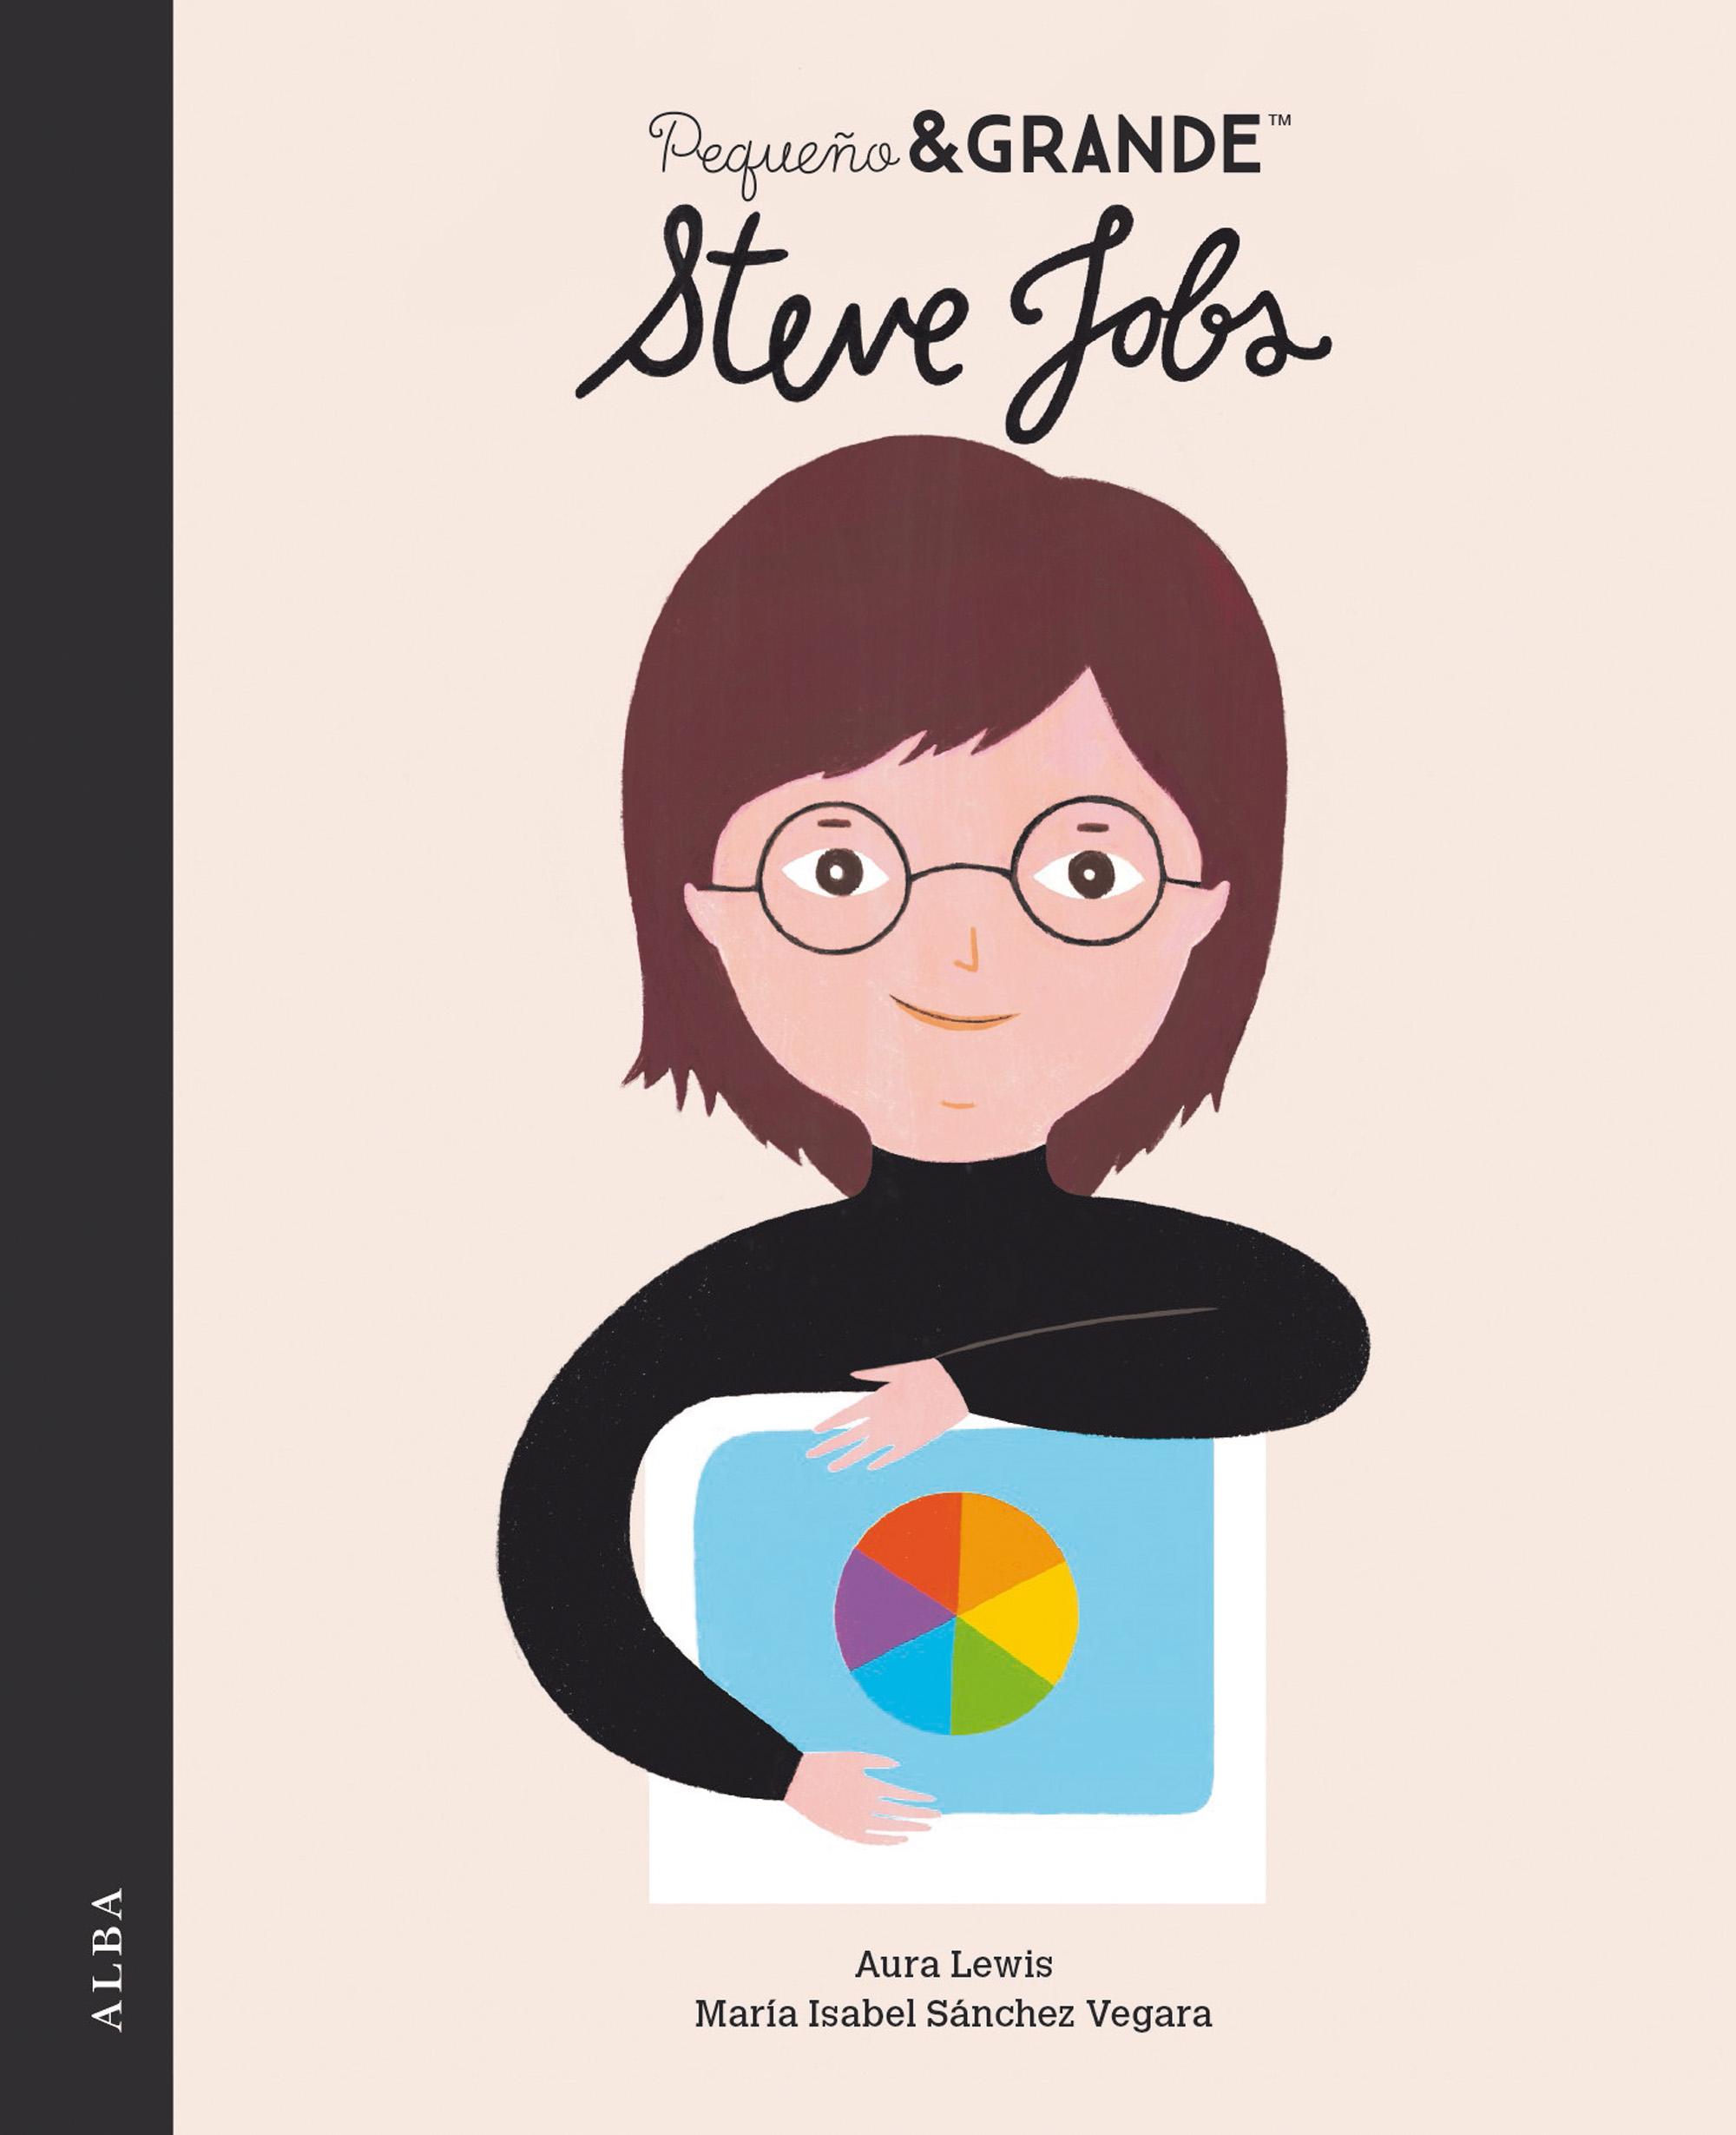 Pequeño&Grande Steve Jobs